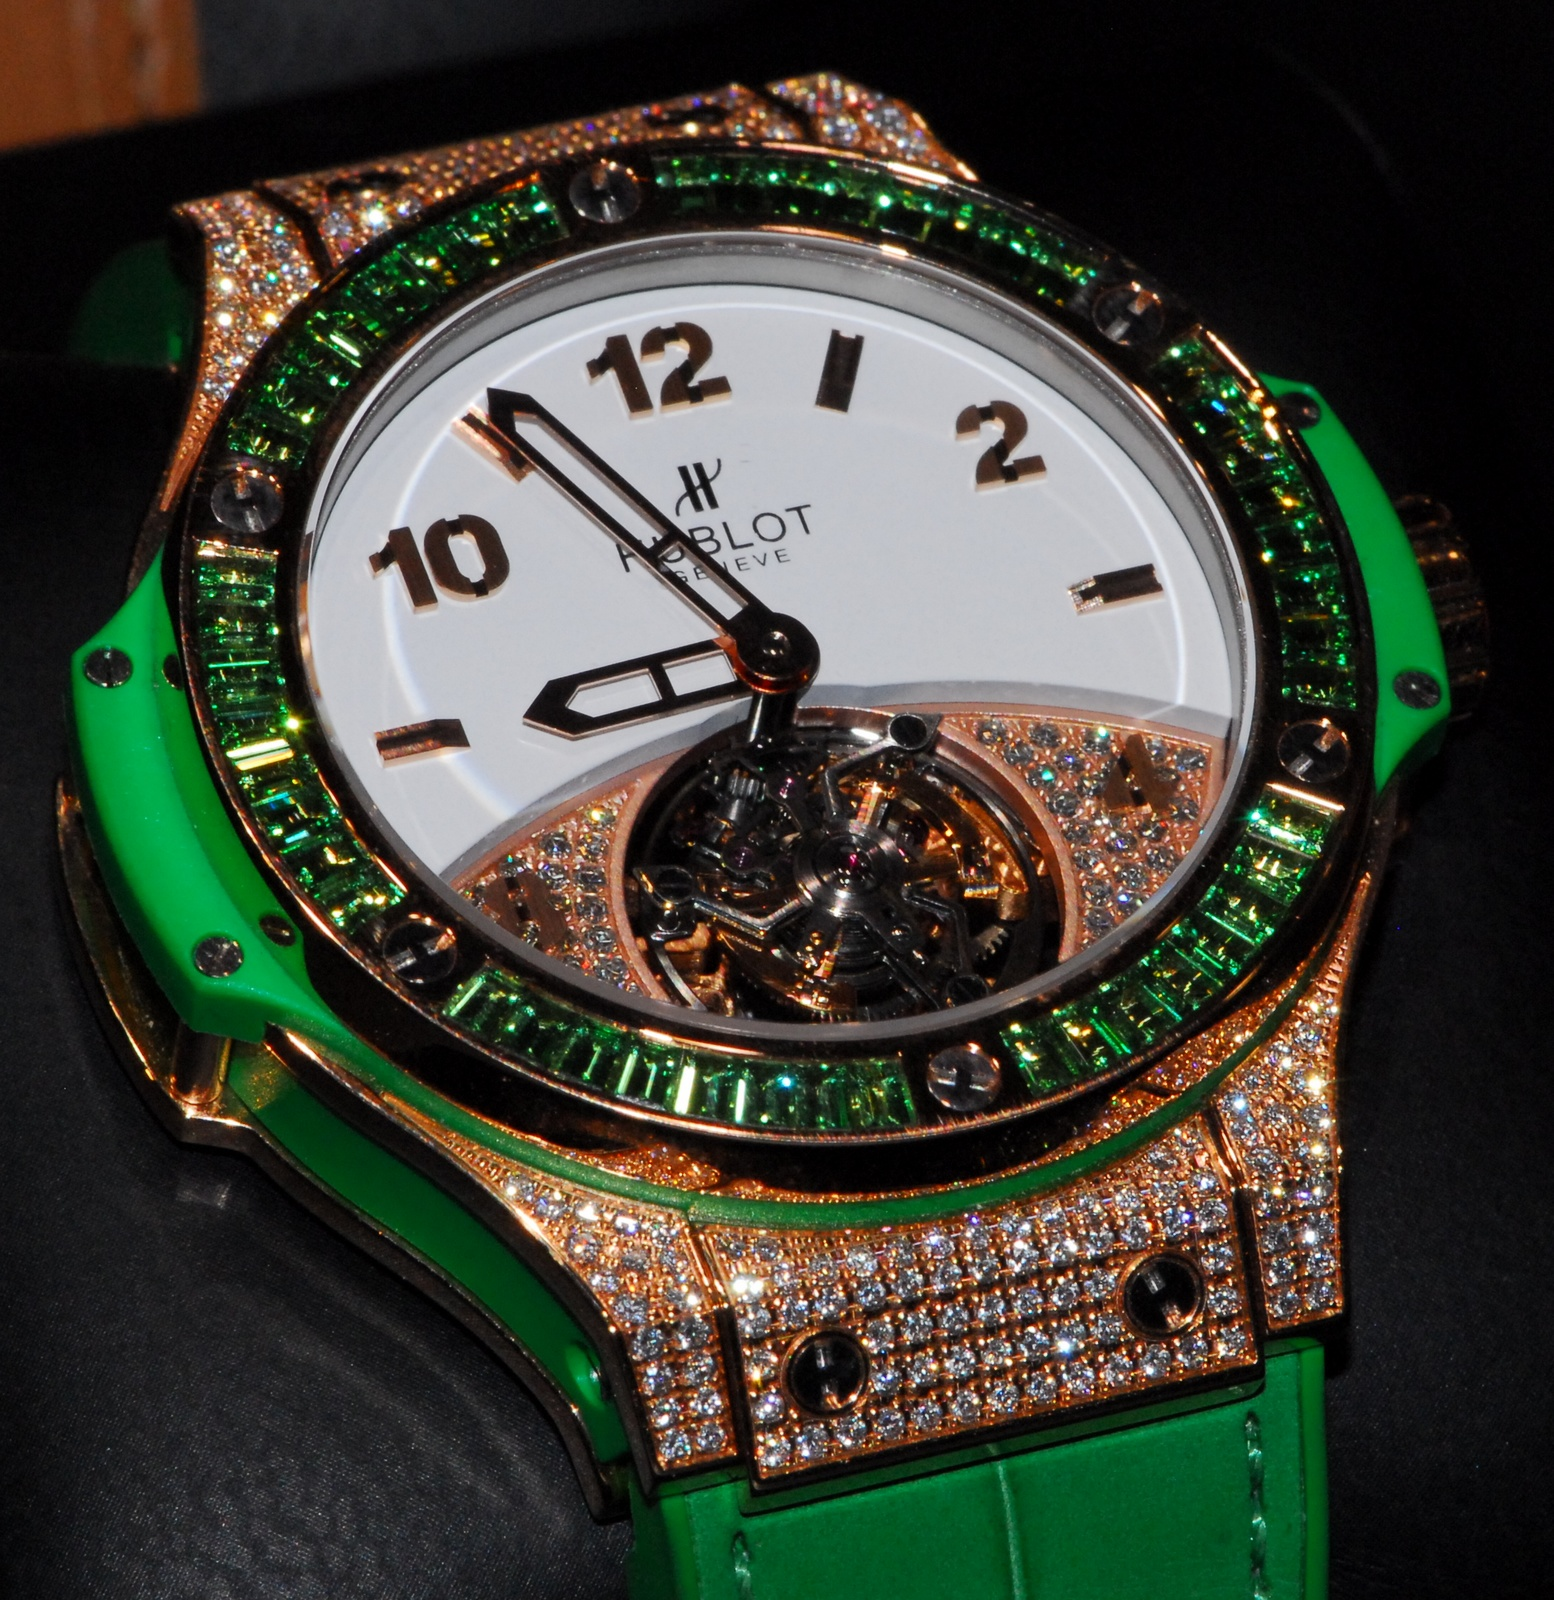 j 39 aime les montres la montre du jour hublot big bang tutti frutti tourbillon baselworld 2012. Black Bedroom Furniture Sets. Home Design Ideas